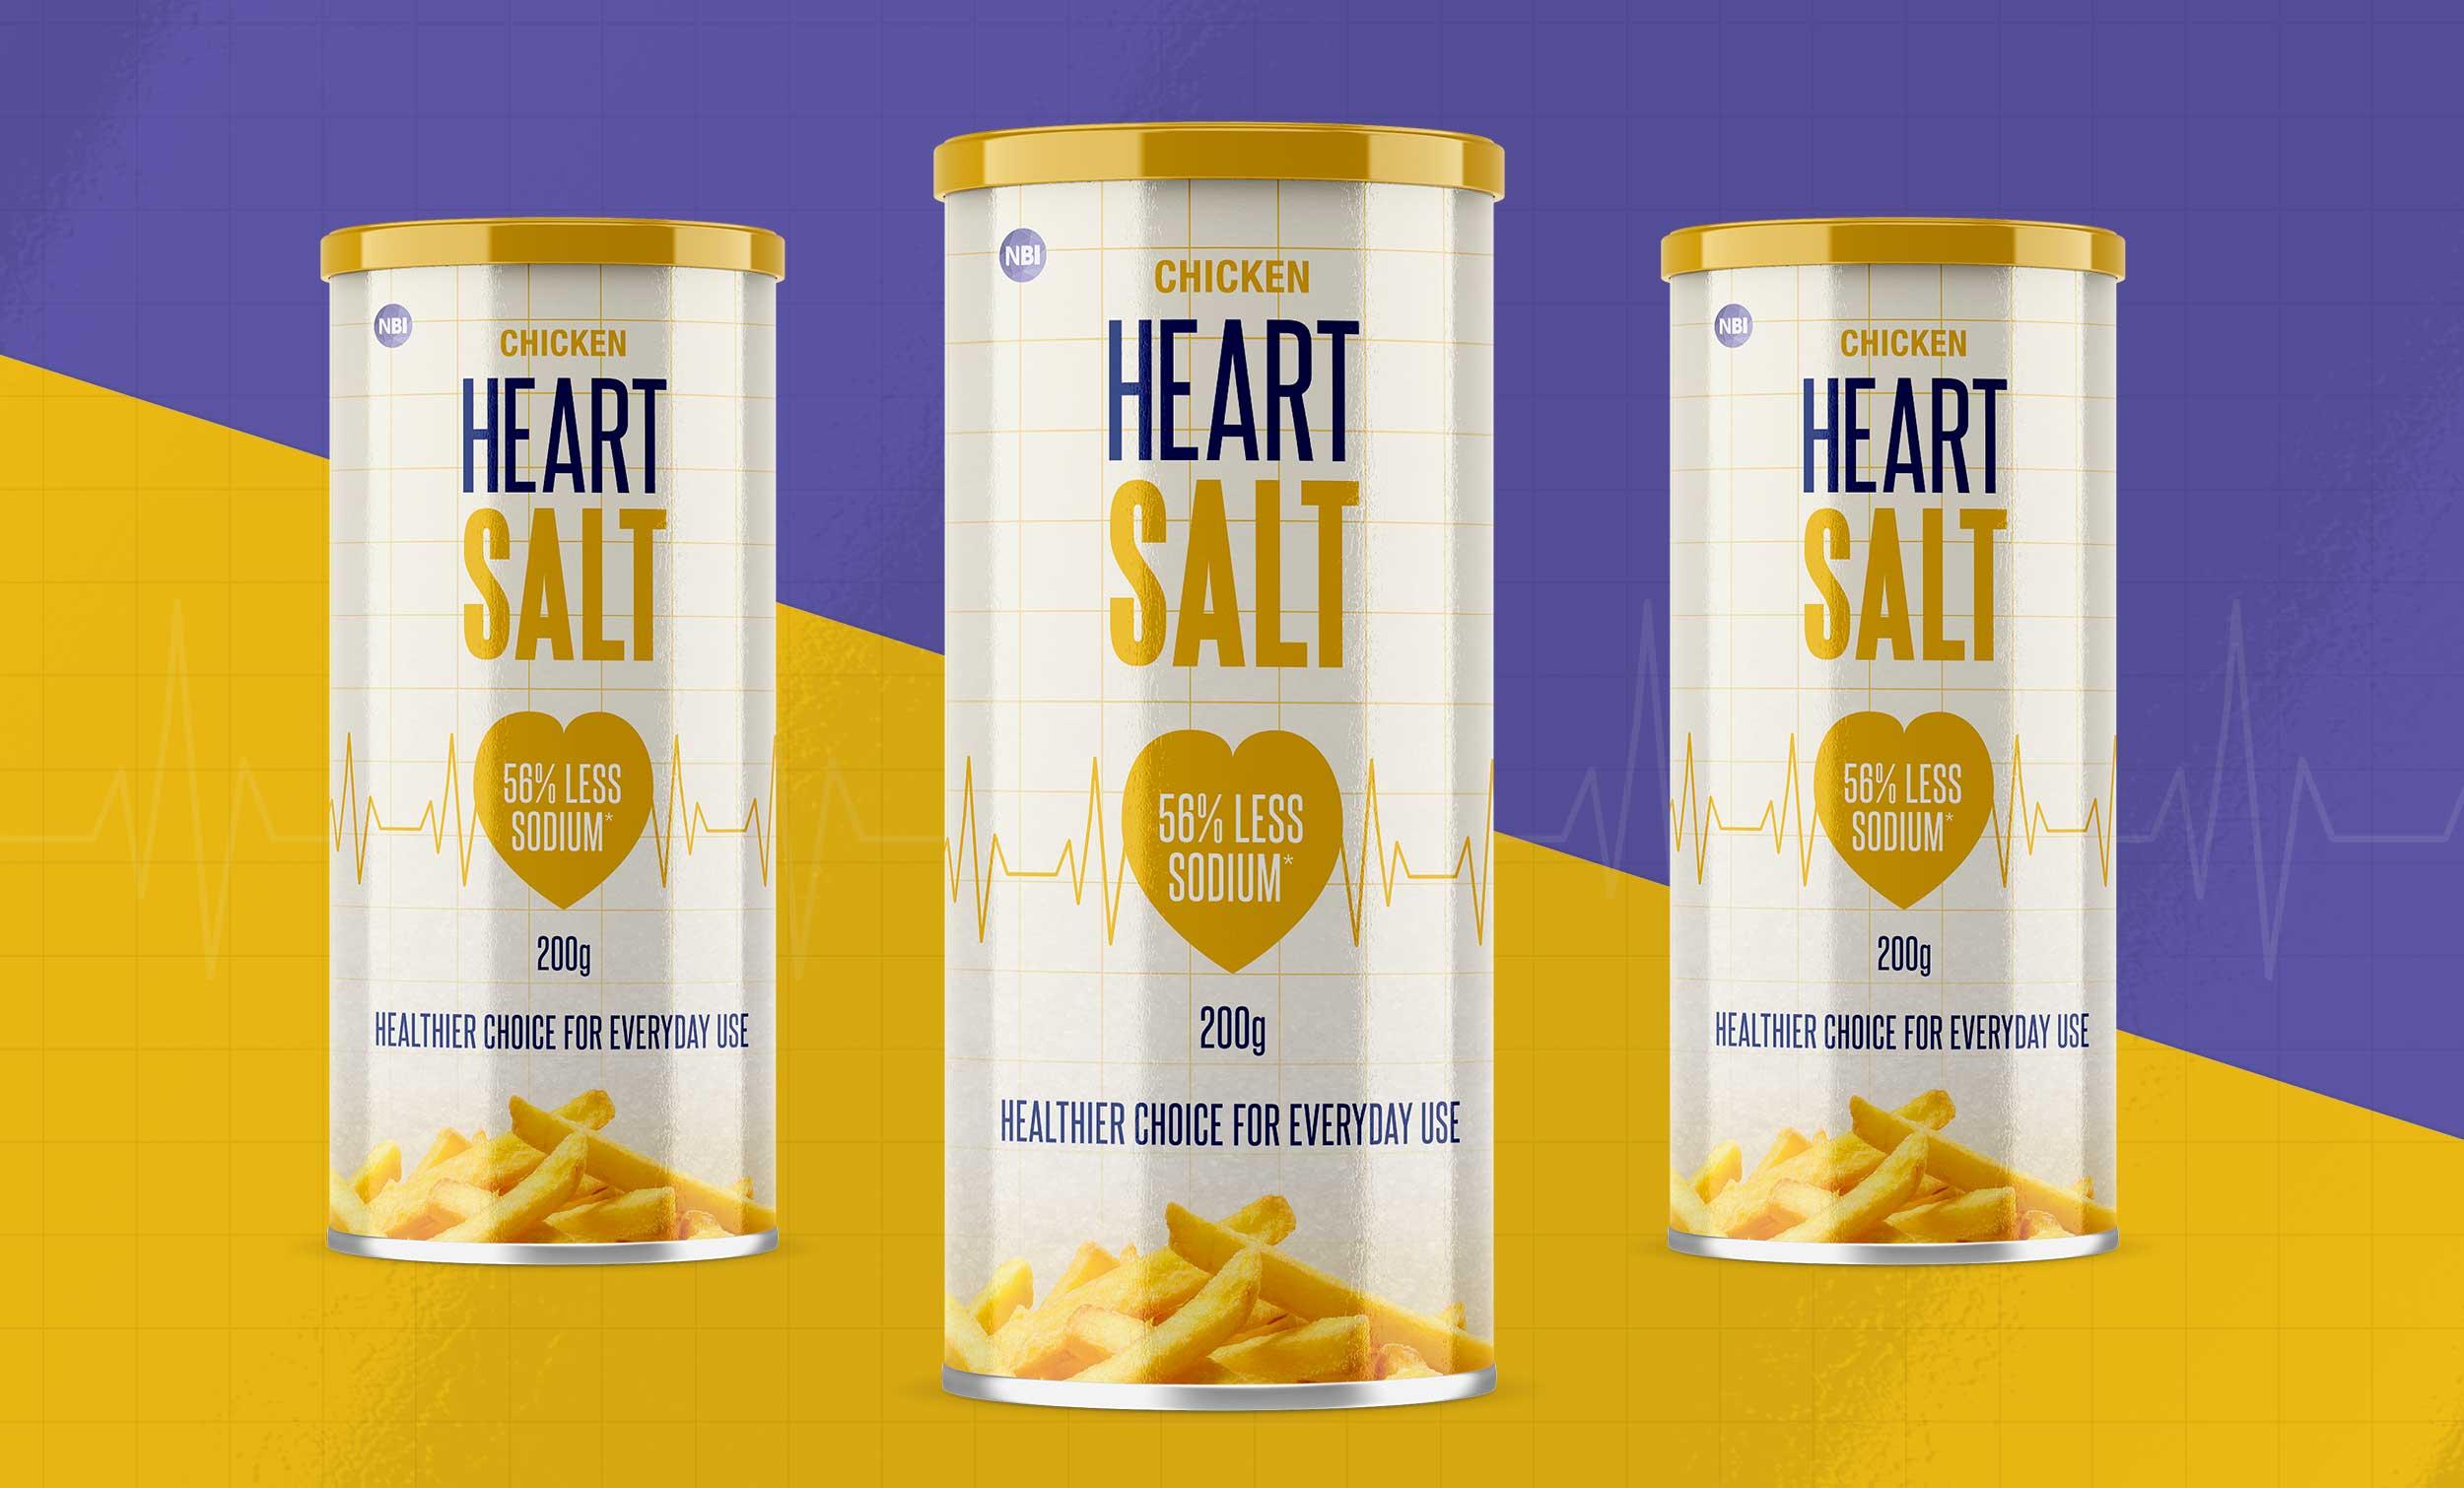 Handle-Branding_Heart-Salt_Packaging_Chicken_002.jpg